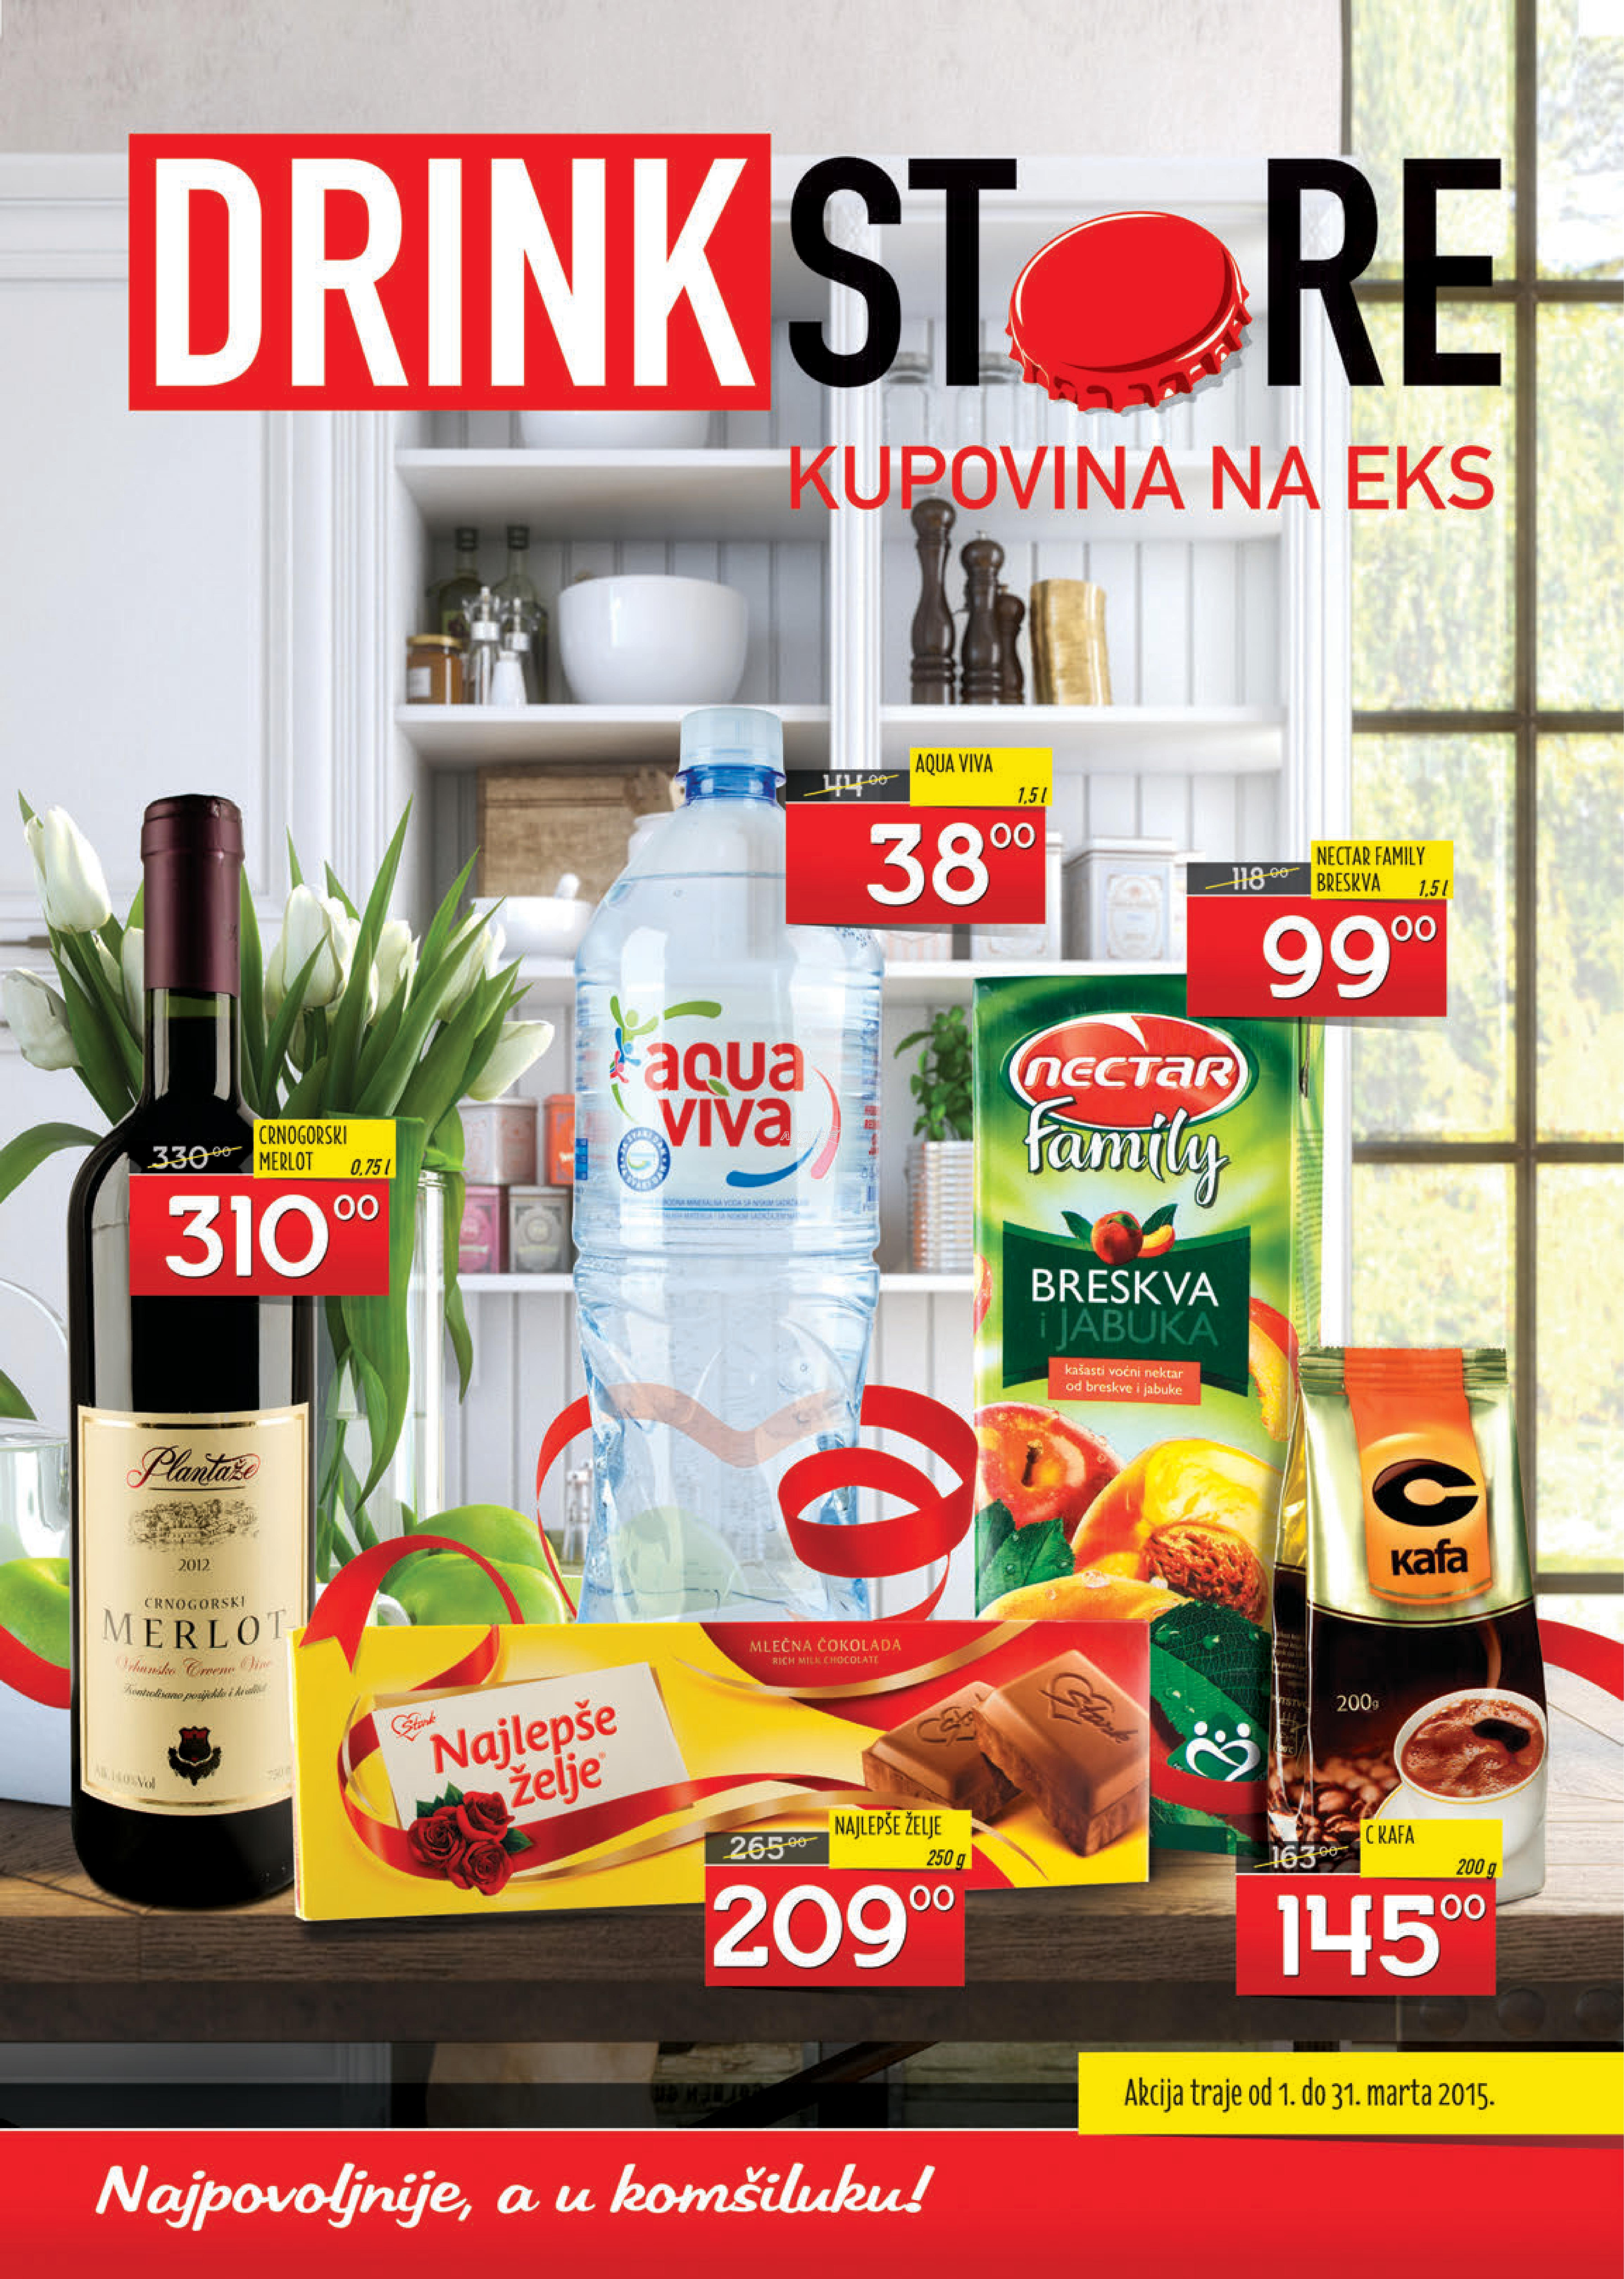 Drink Store akciaj super ponude